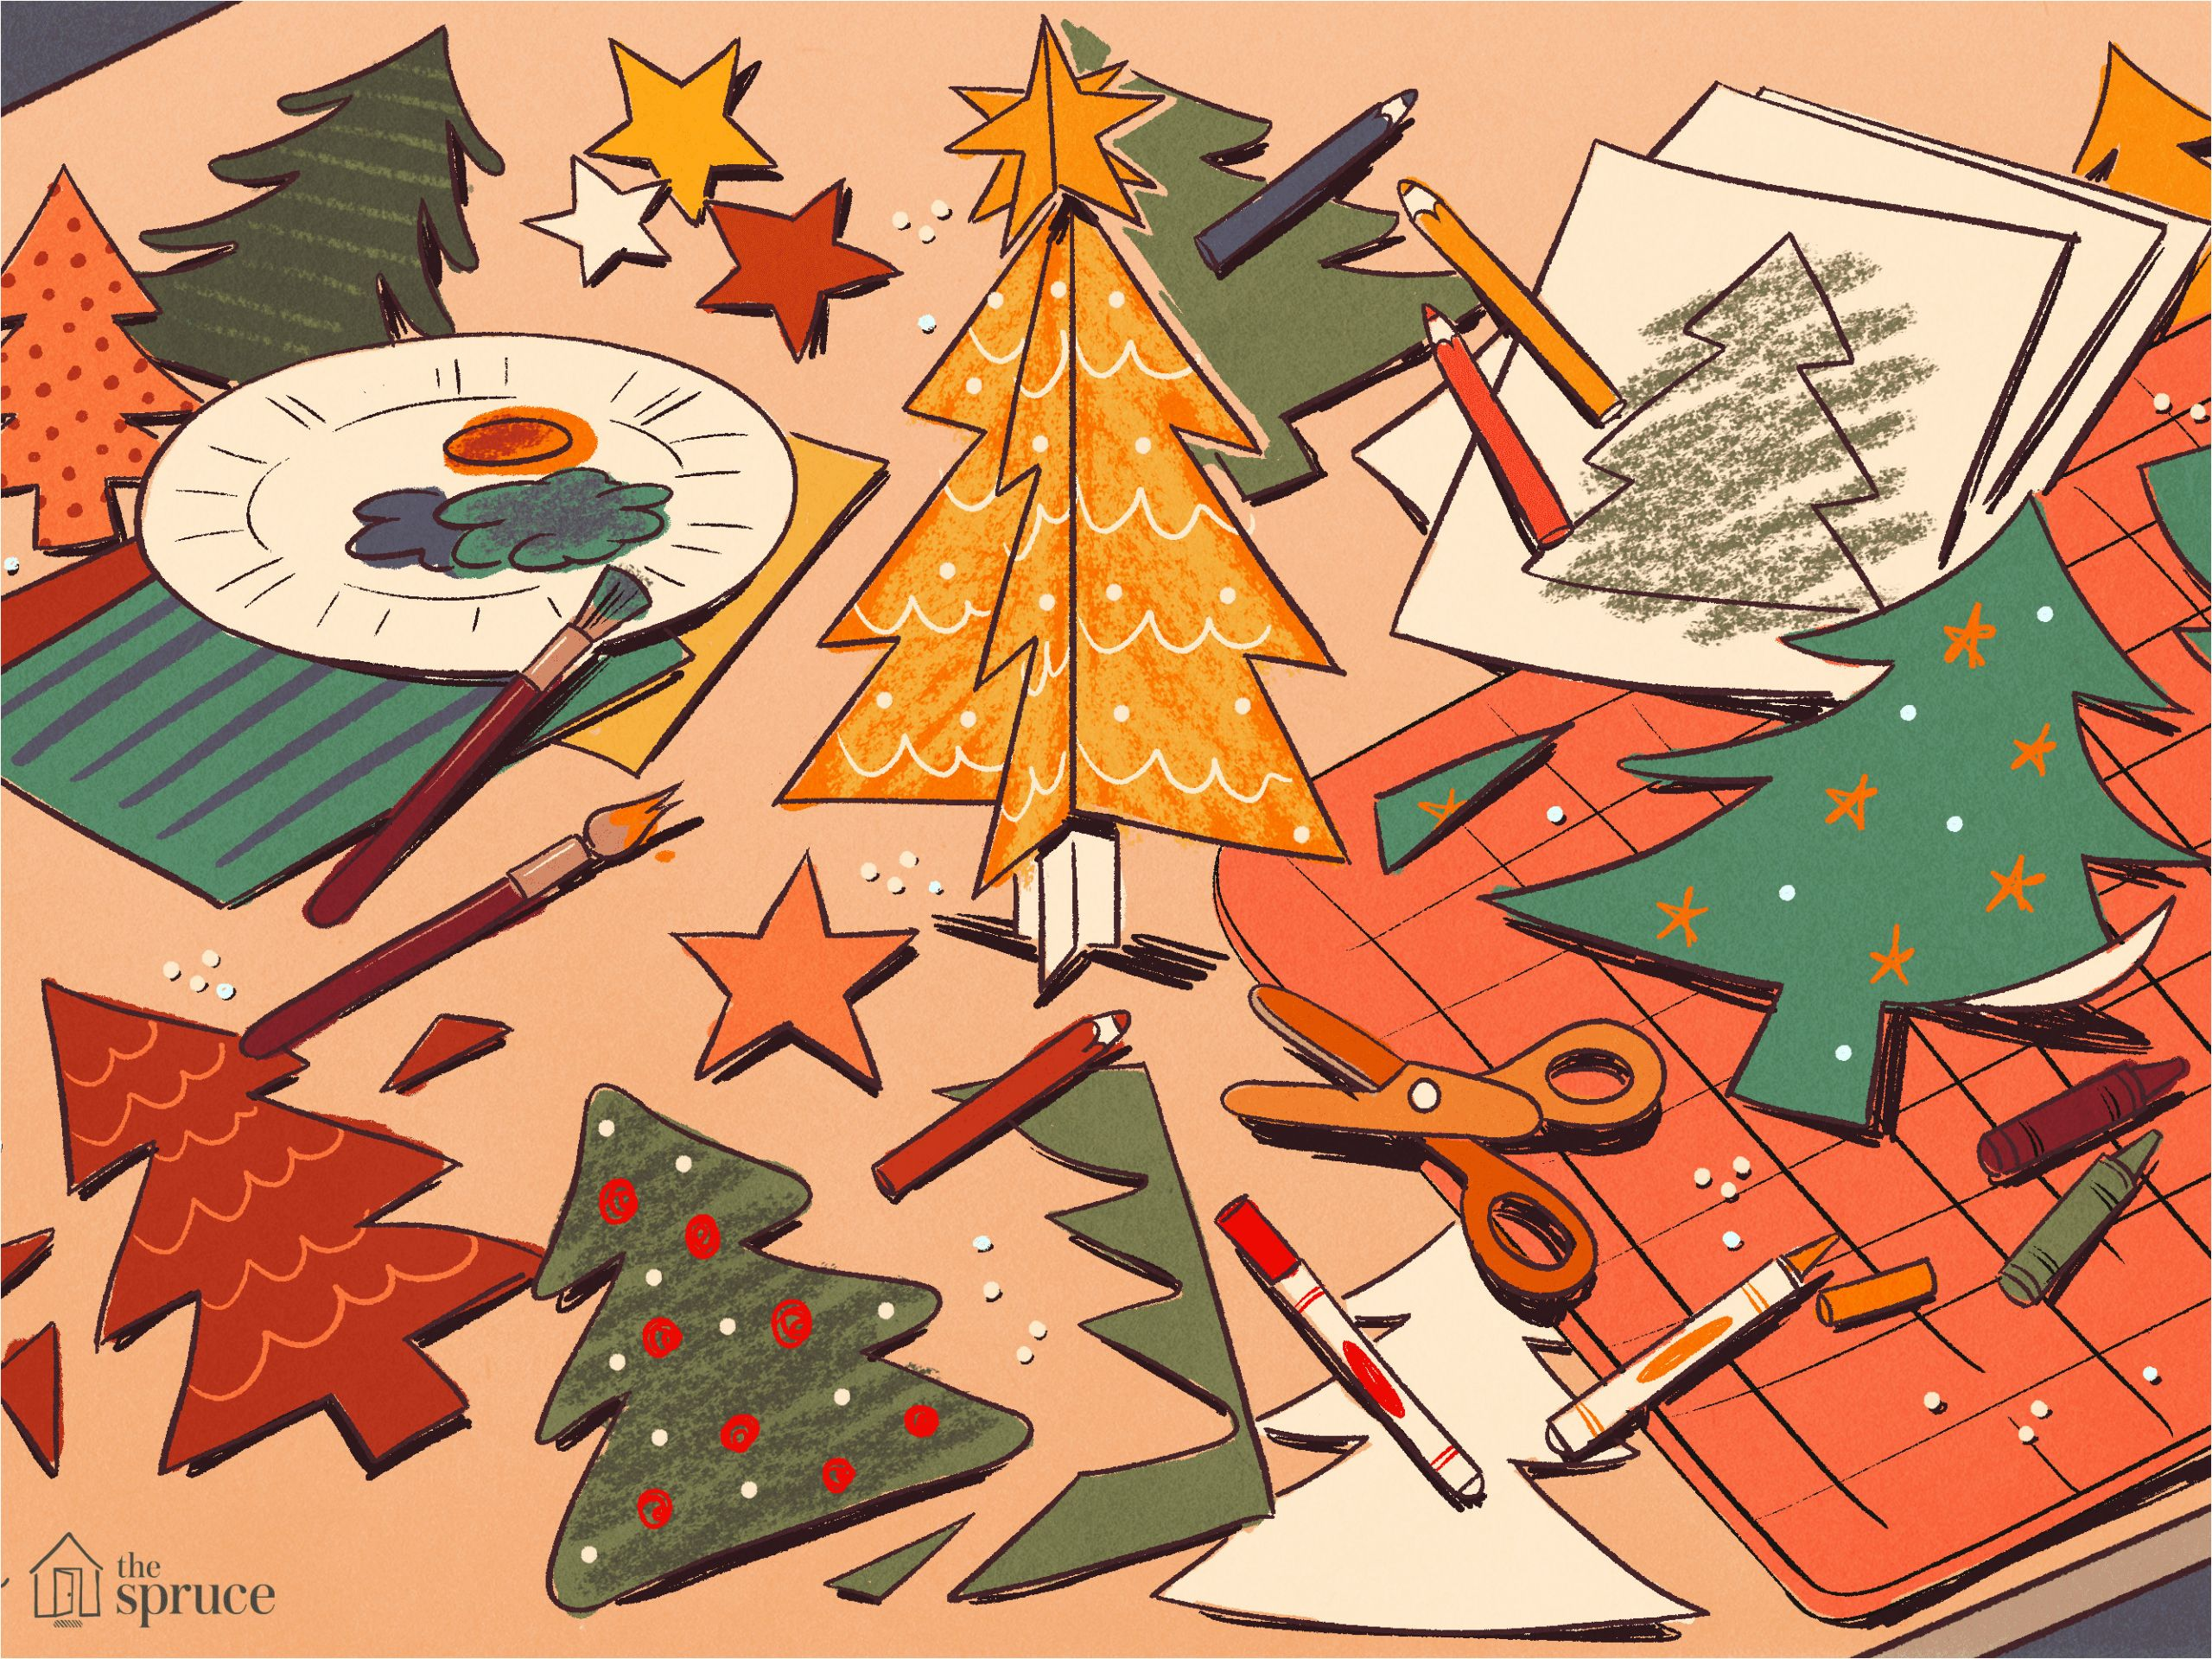 spruce free christmas tree templates 1356277 final bb9853f2e1704d19b61d58db37676b94 png